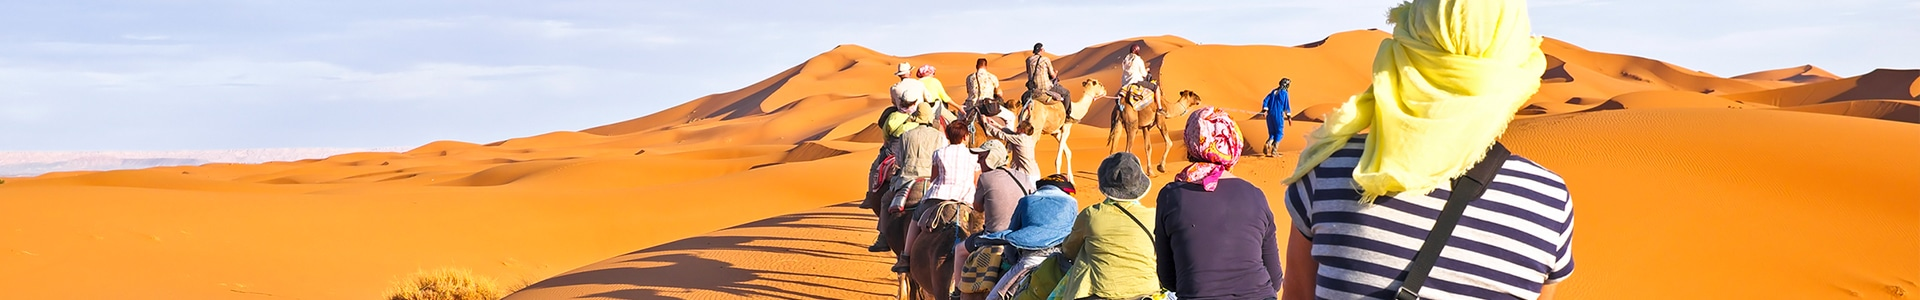 Voyage au Maroc - TUI